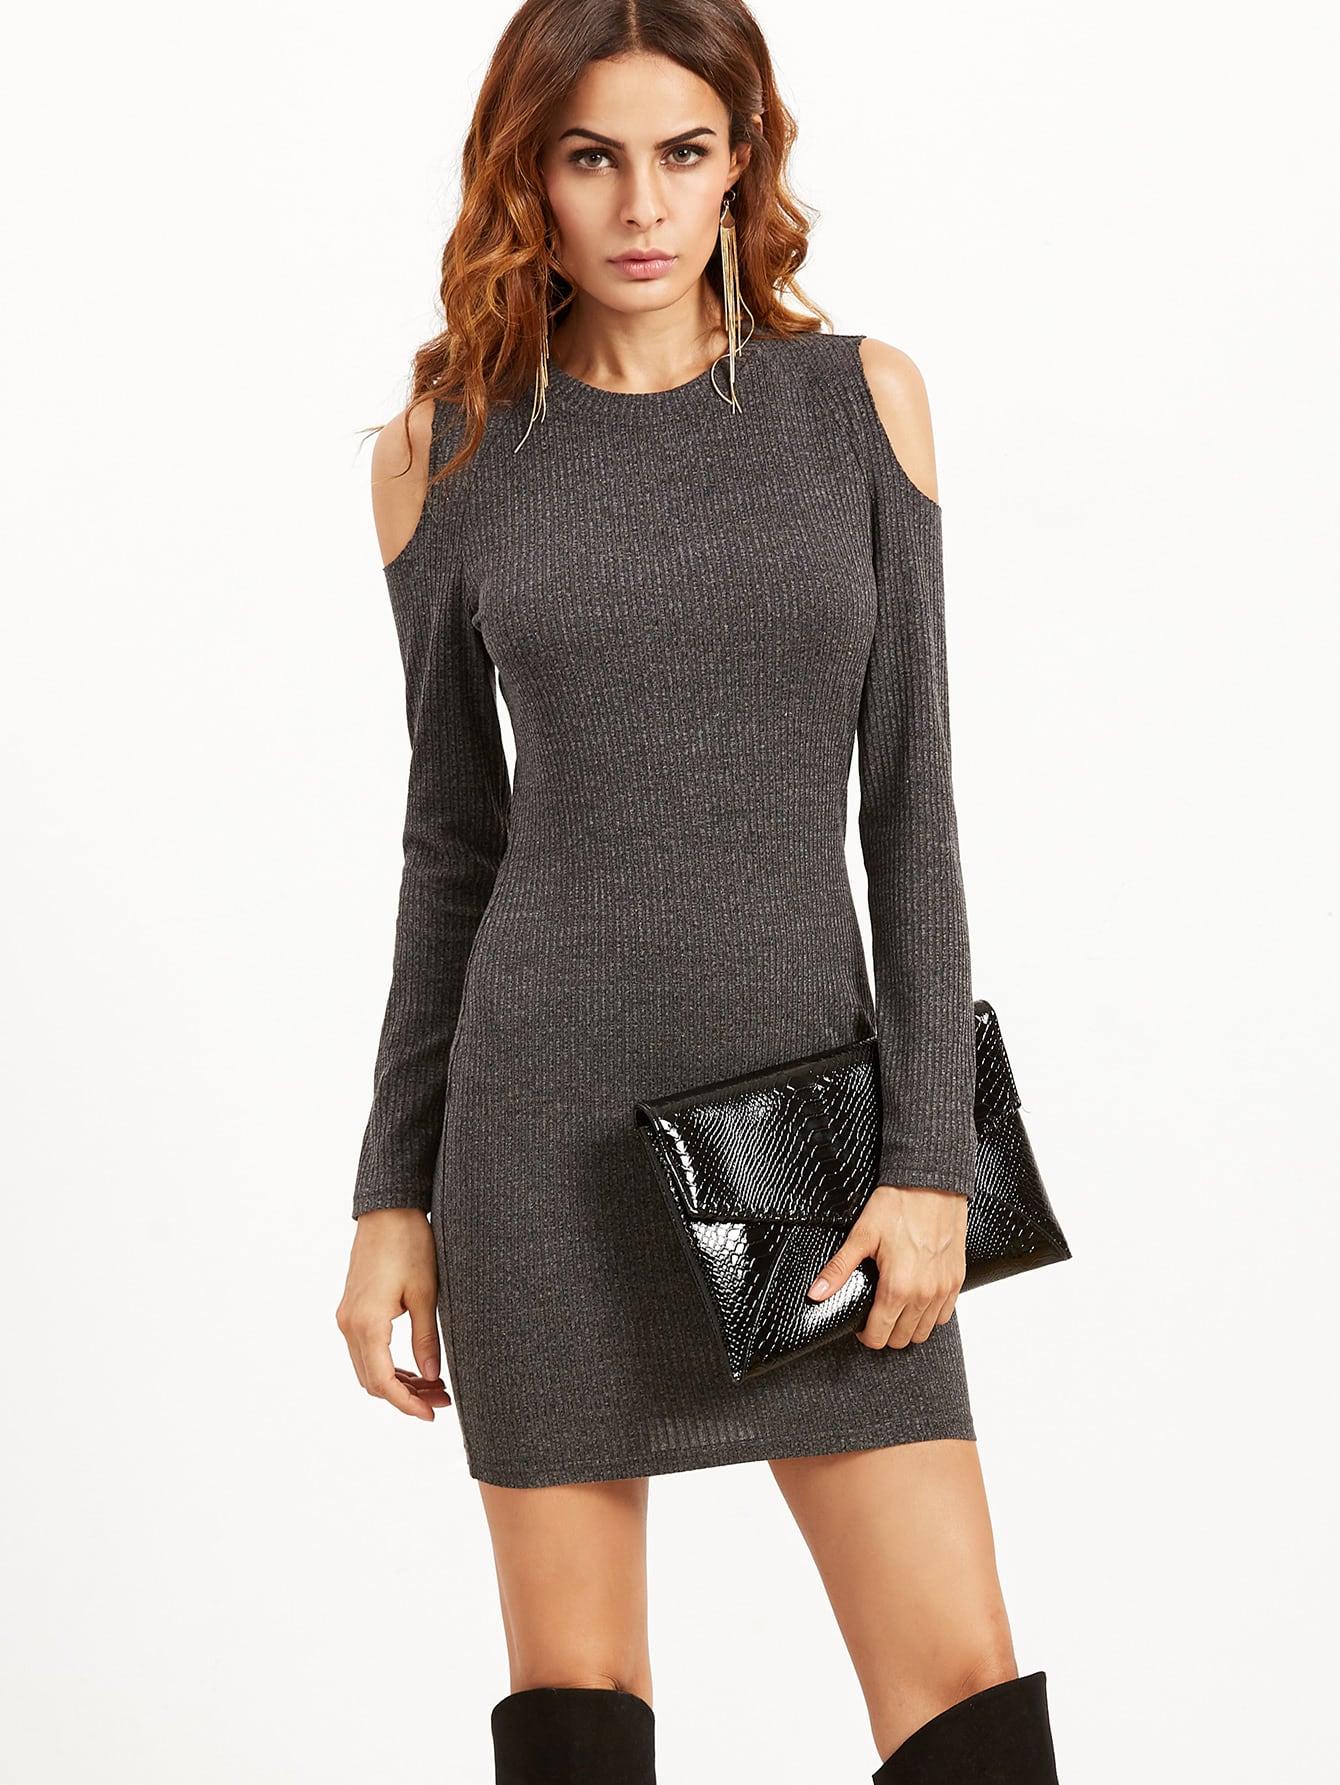 Grey Open Shoulder Ribbed Bodycon Dress dress160919501